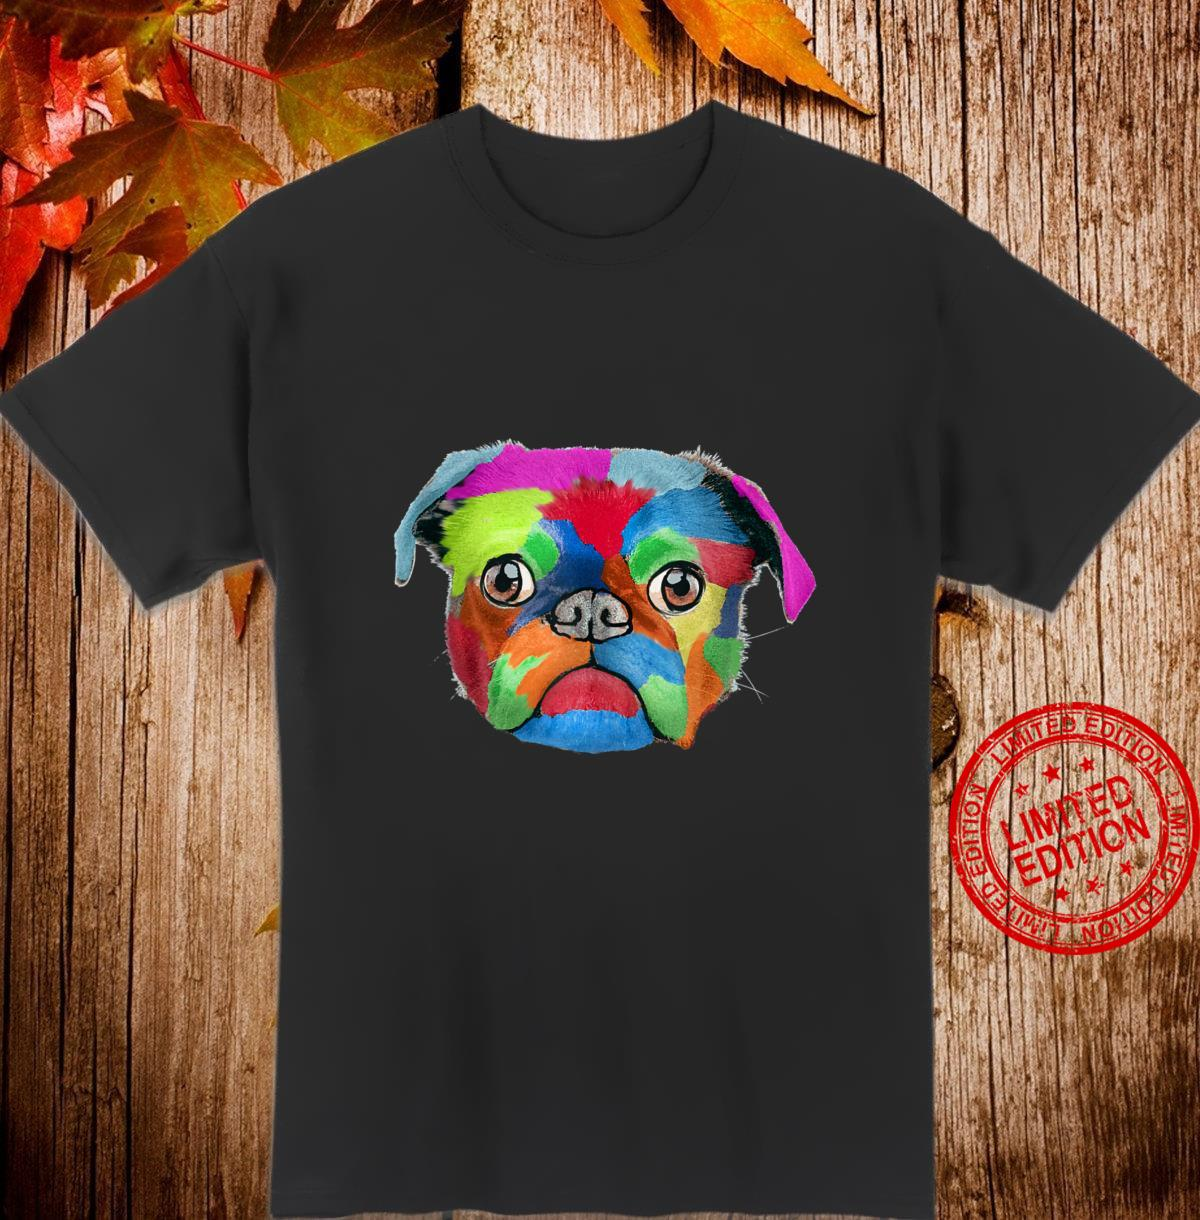 Vintage Pug Dog Colorful Art Shirt